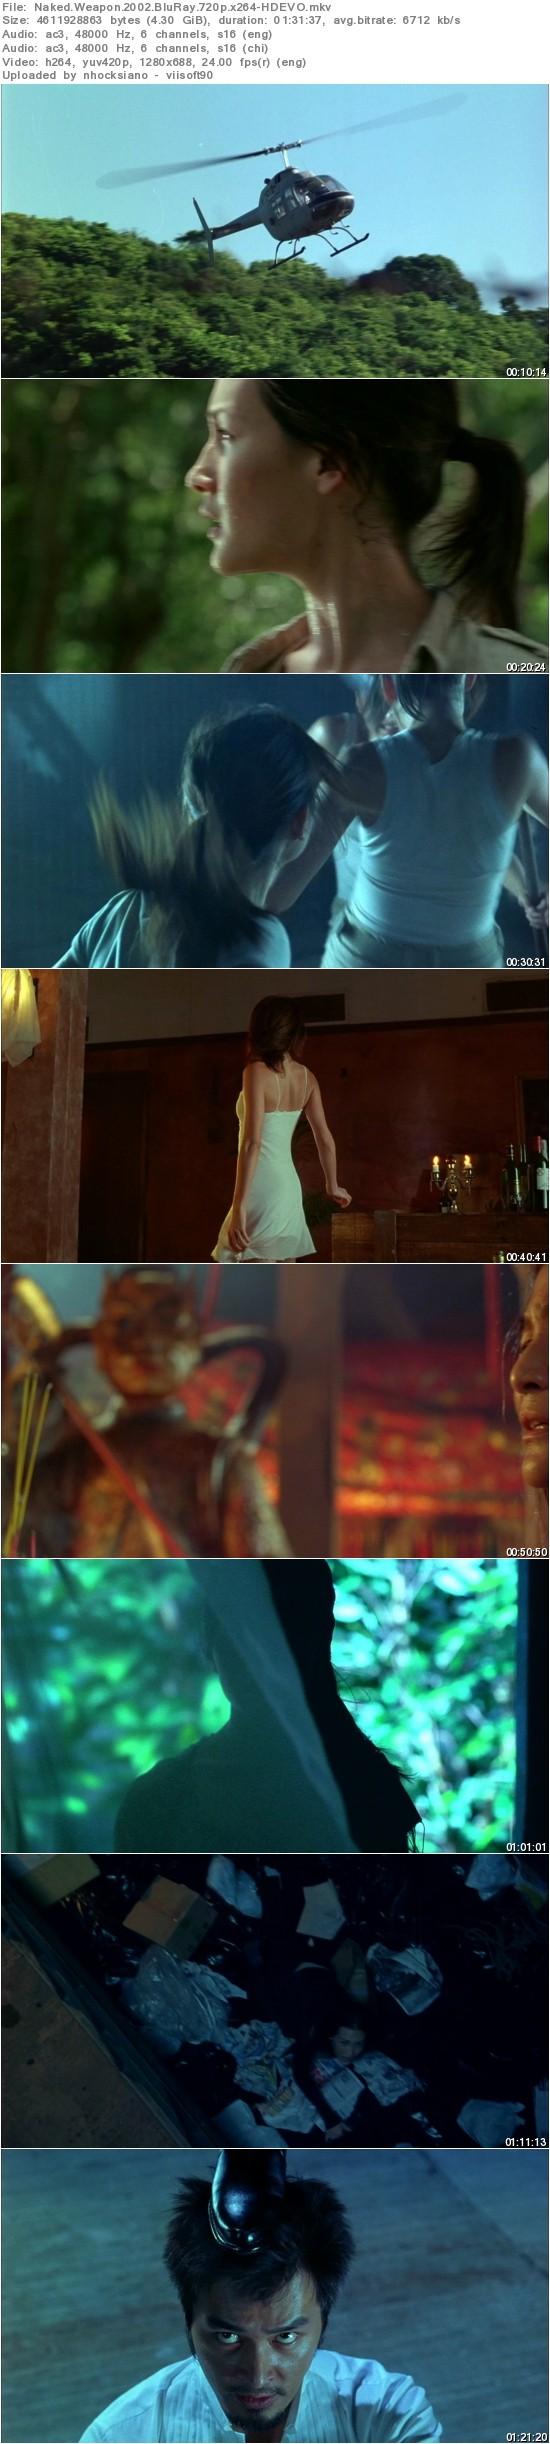 Naked Weapon (2002) BluRay 720p x264 AC3 - HDEVO